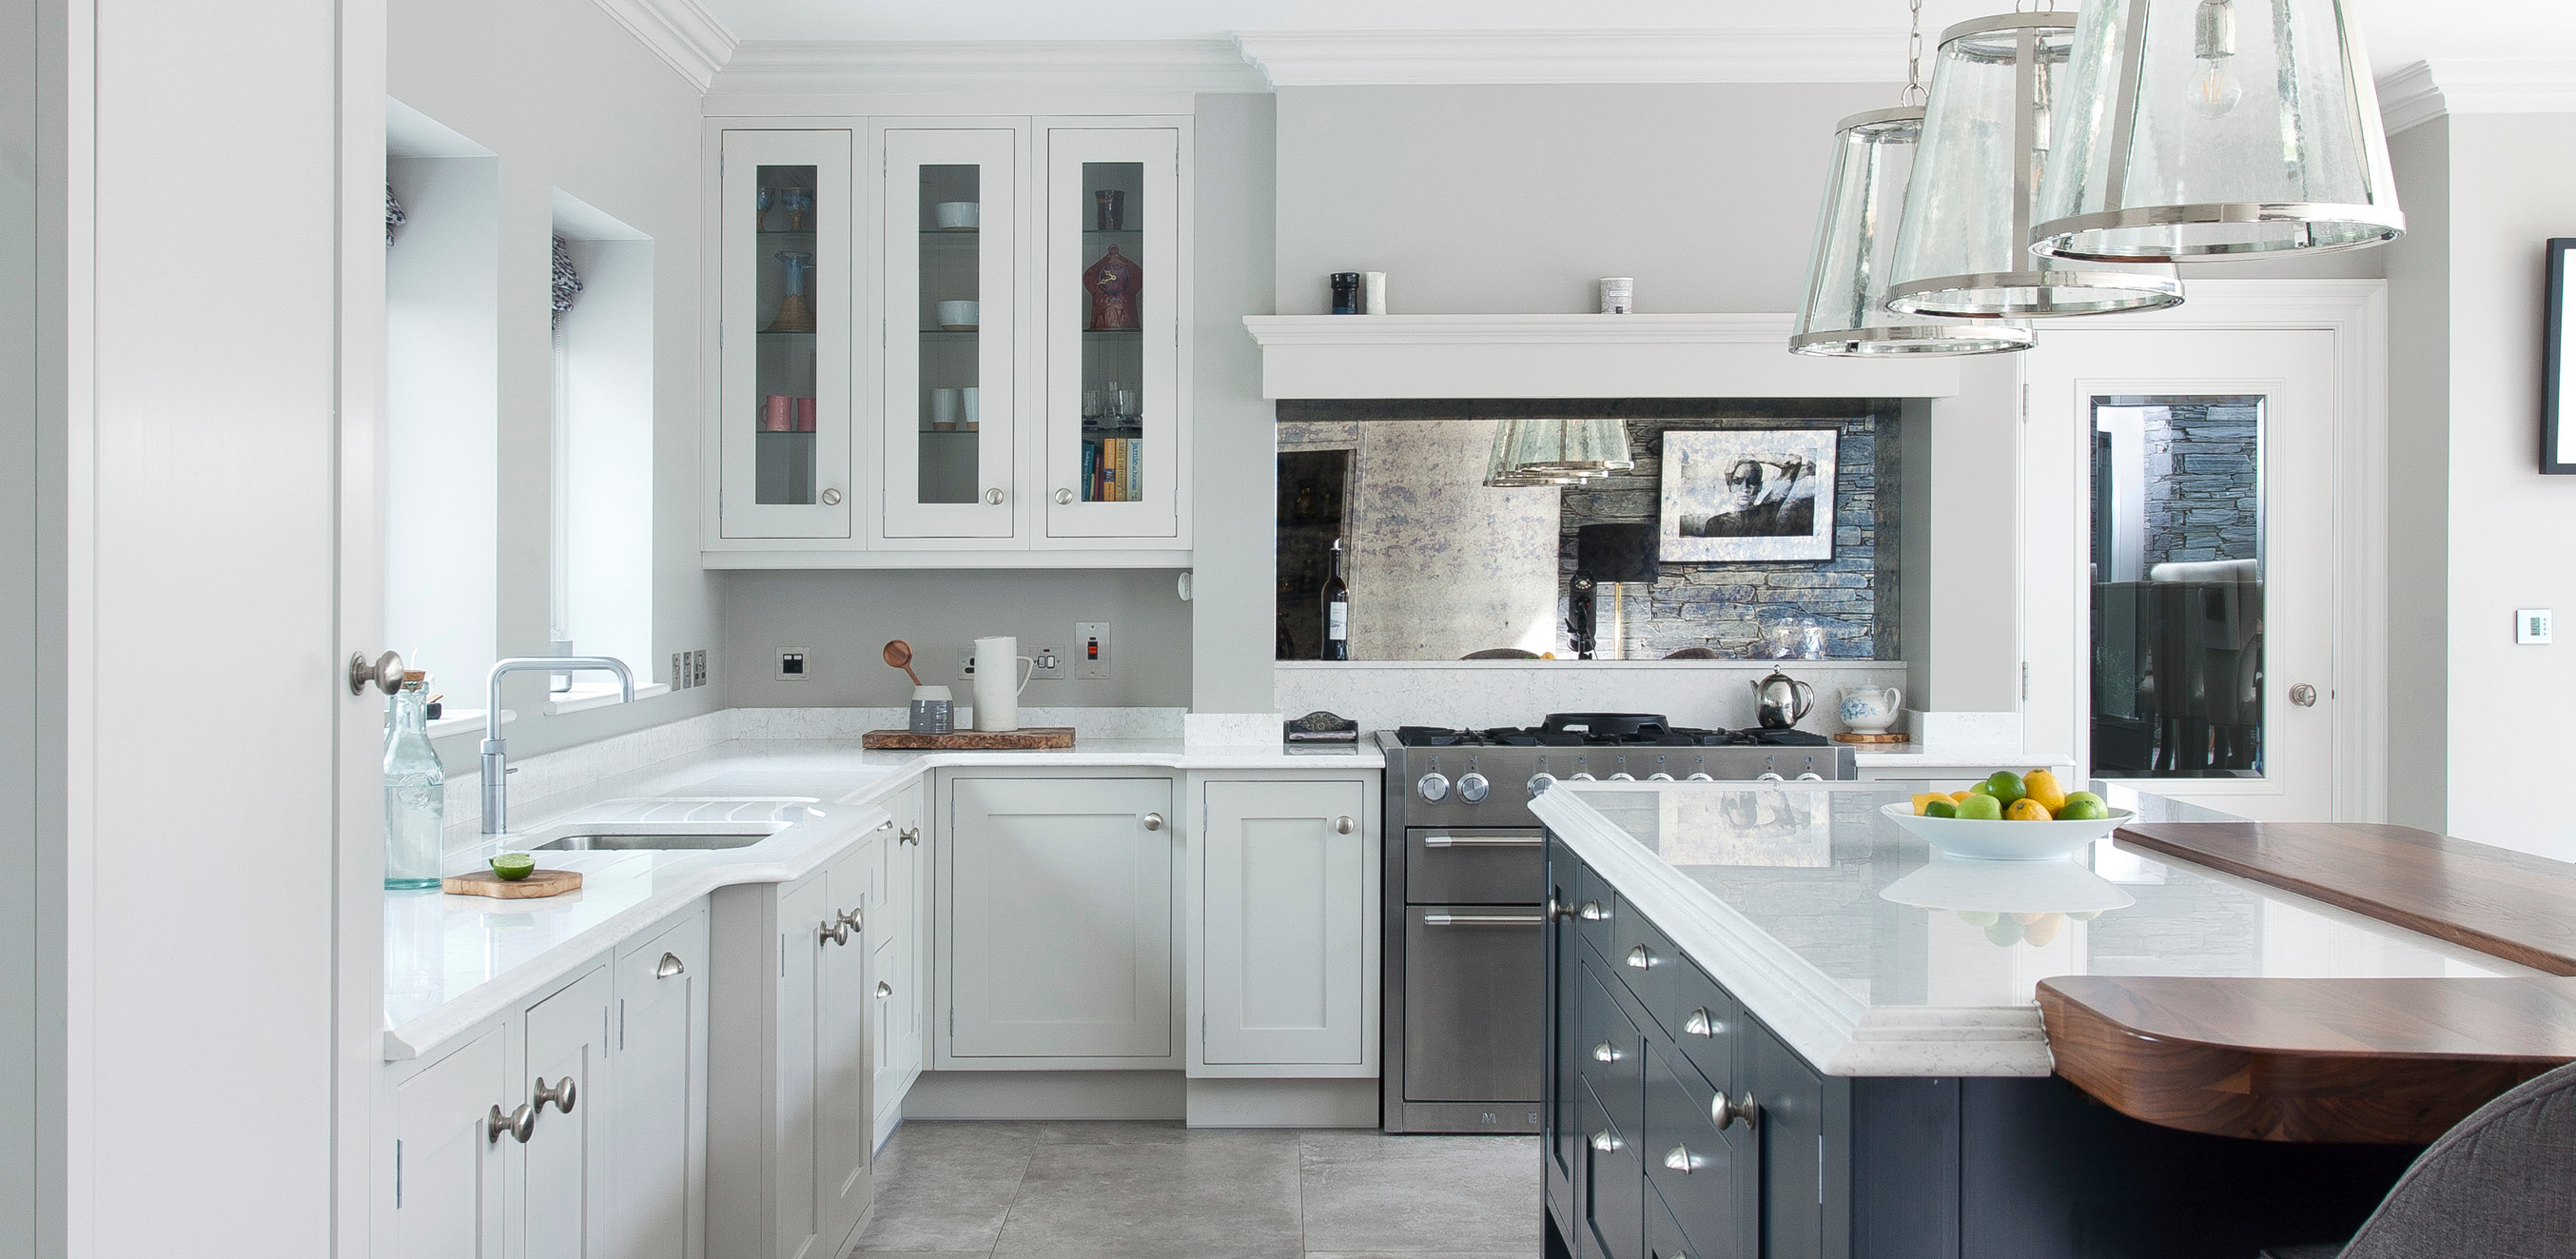 Modern Classic Kitchen, Co Fermanagh  3